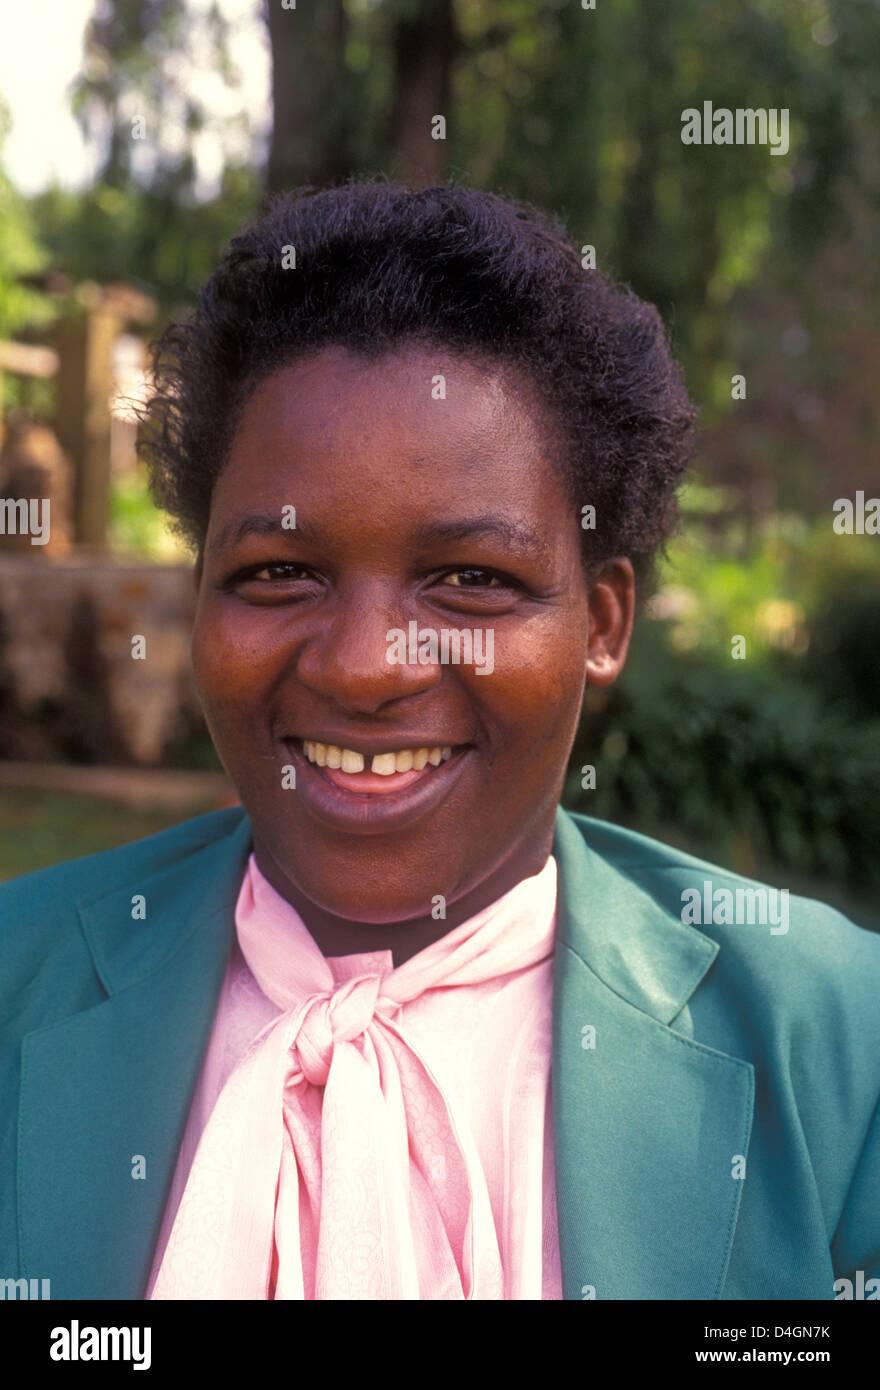 1, one, Zimbabwean, woman, adult woman, waitress, worker, working, Rhodes-Nyanga Hotel, Nyanga, Manicaland Province, - Stock Image